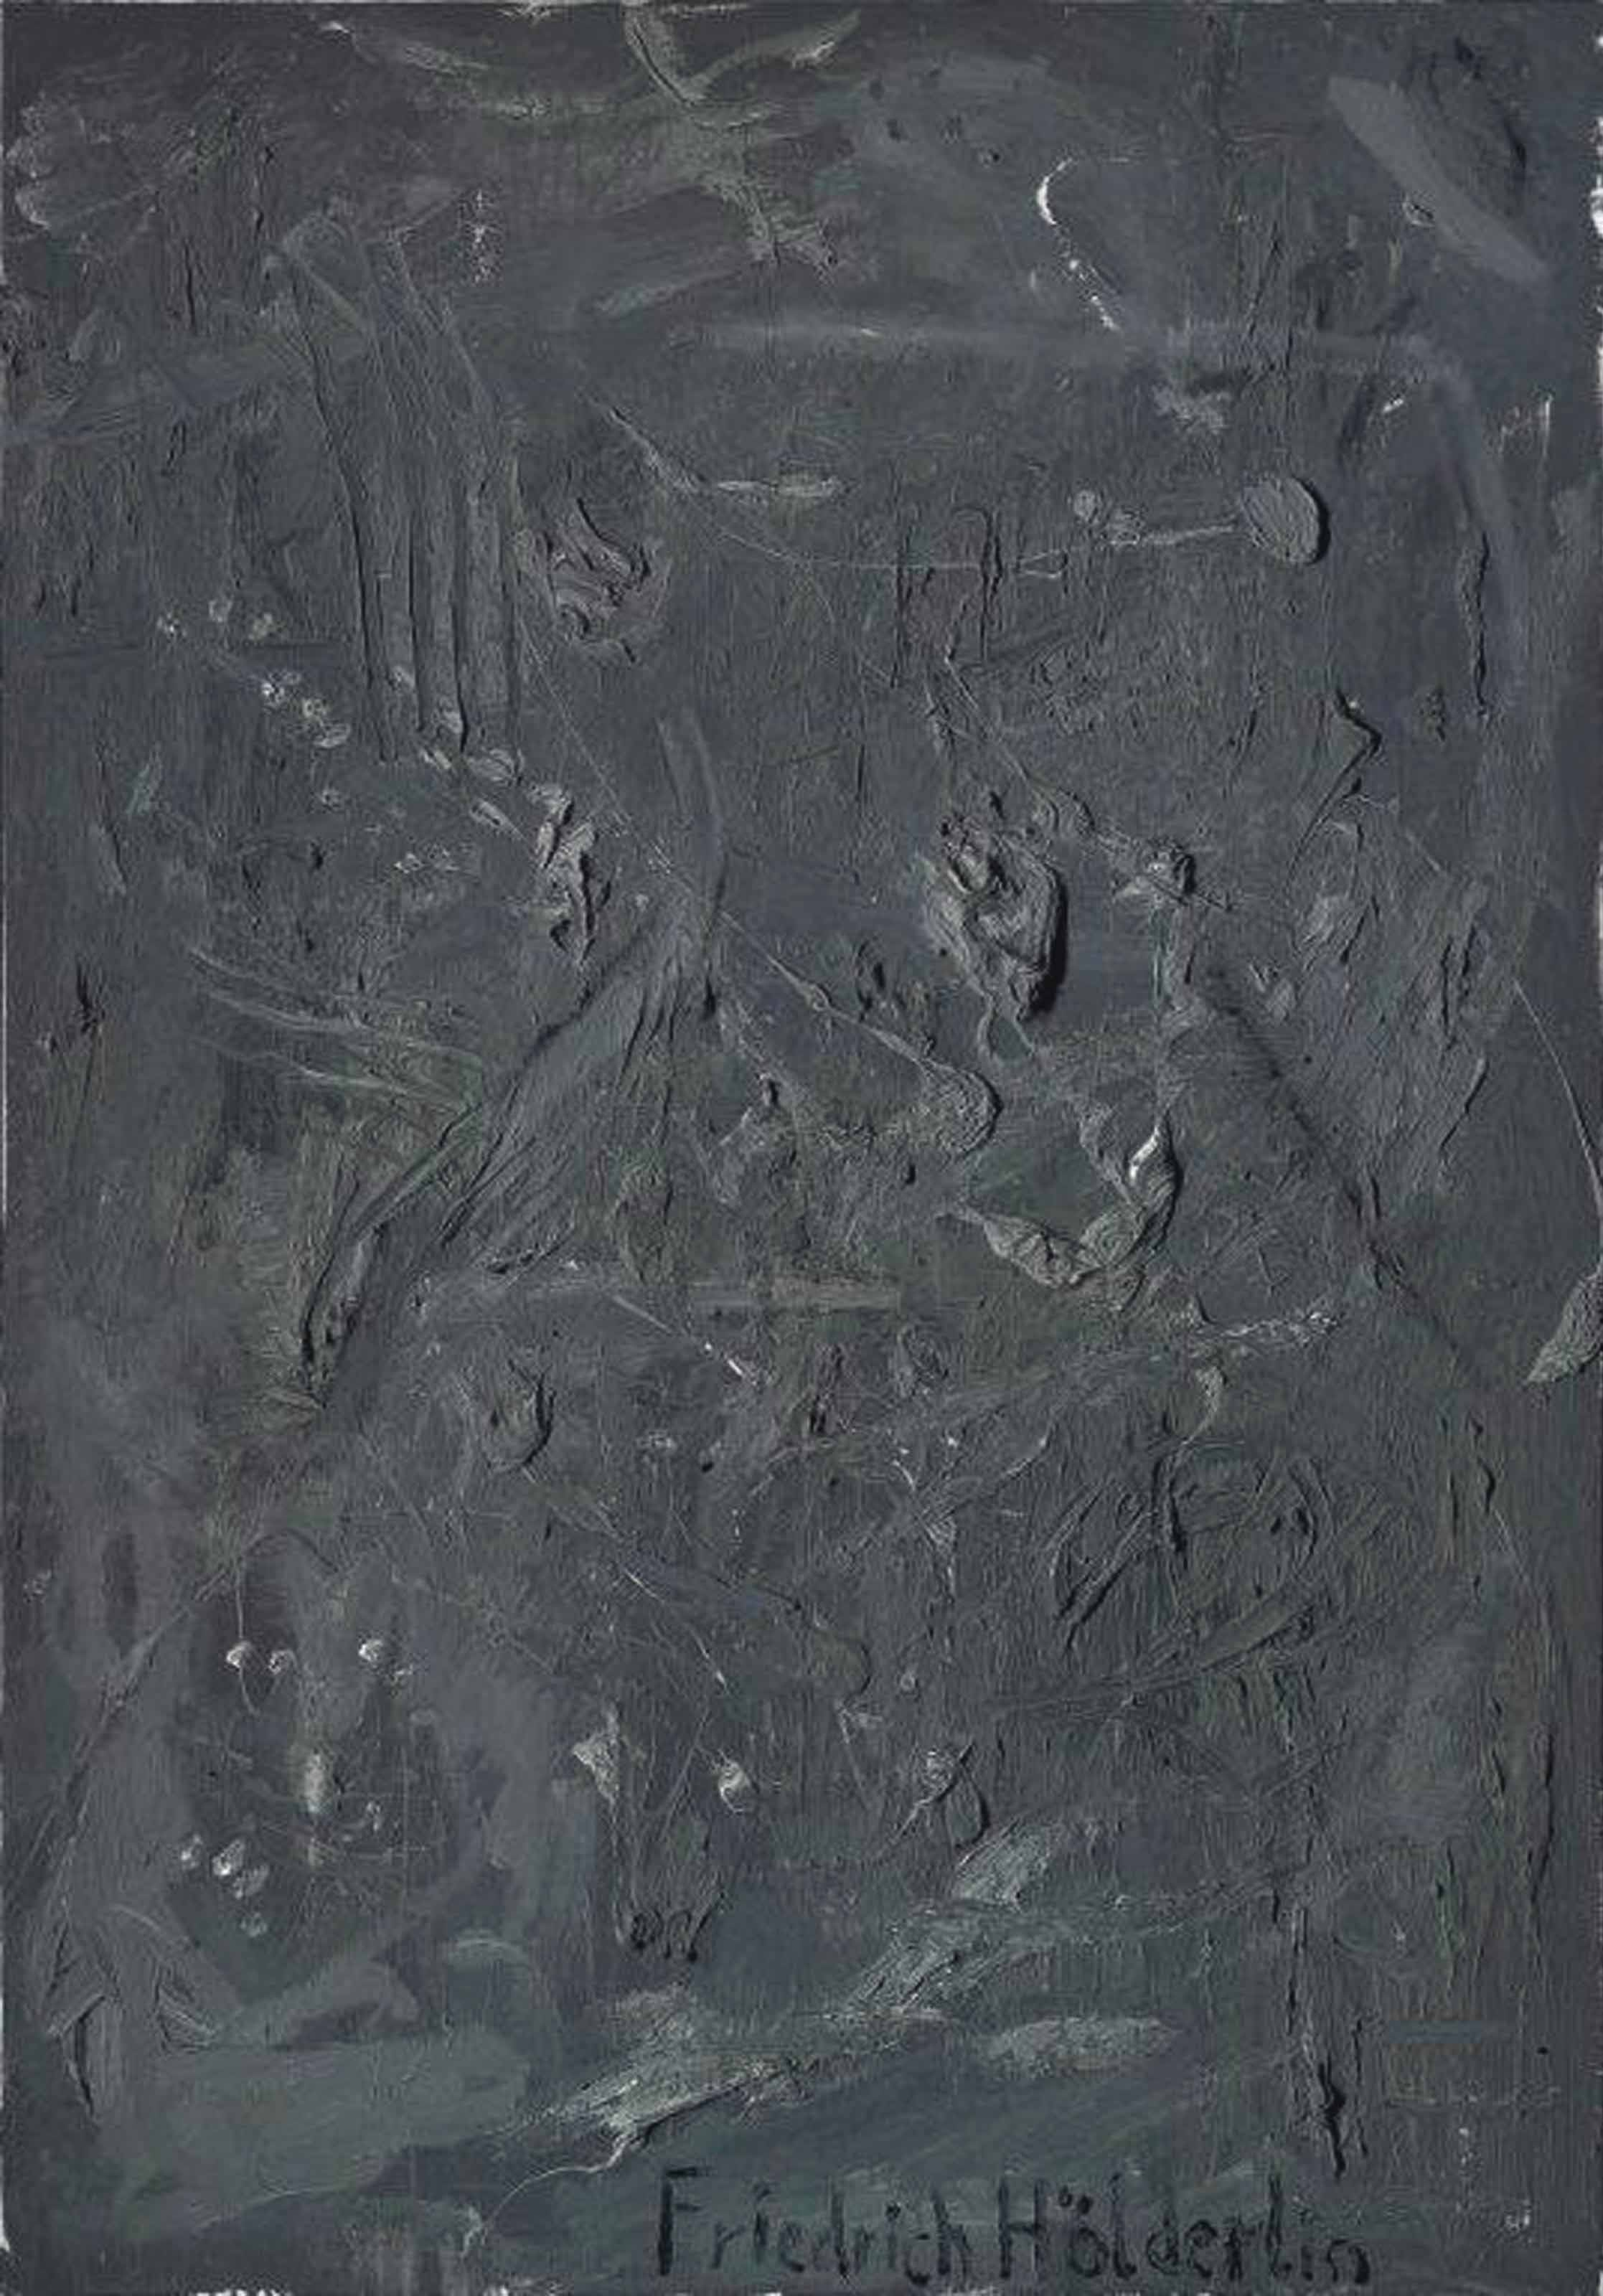 Untitled (Friedrich Hölderlin)